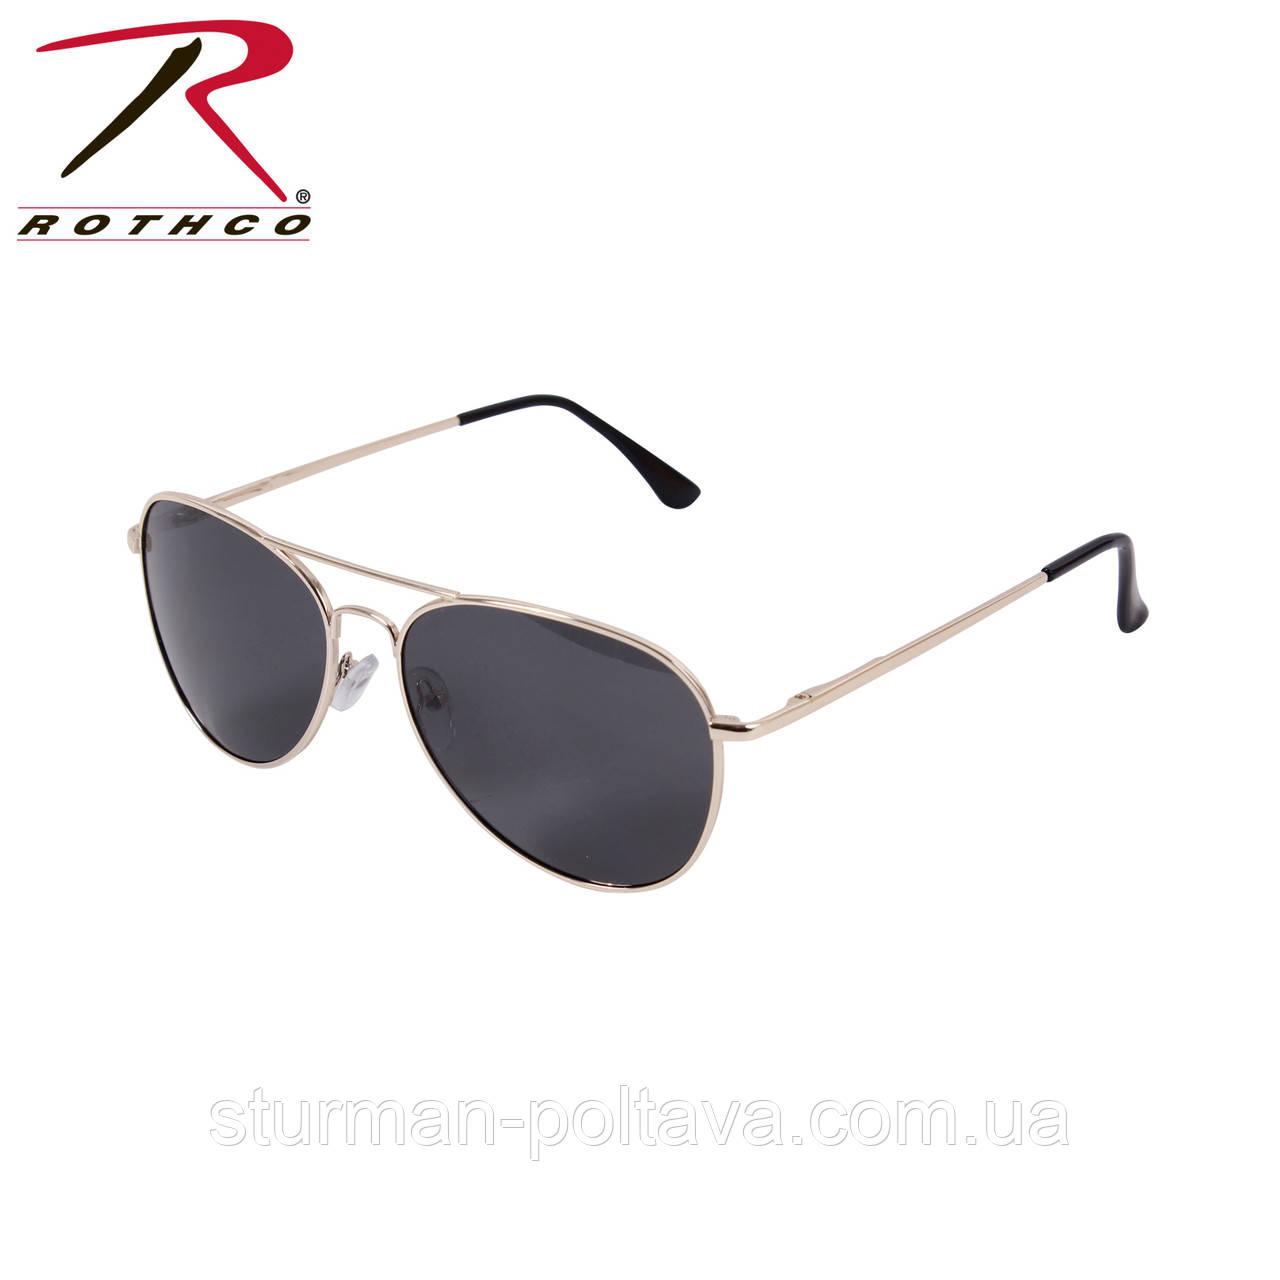 Очки поляризационные  Rothco 58mm Polarized Sunglasses